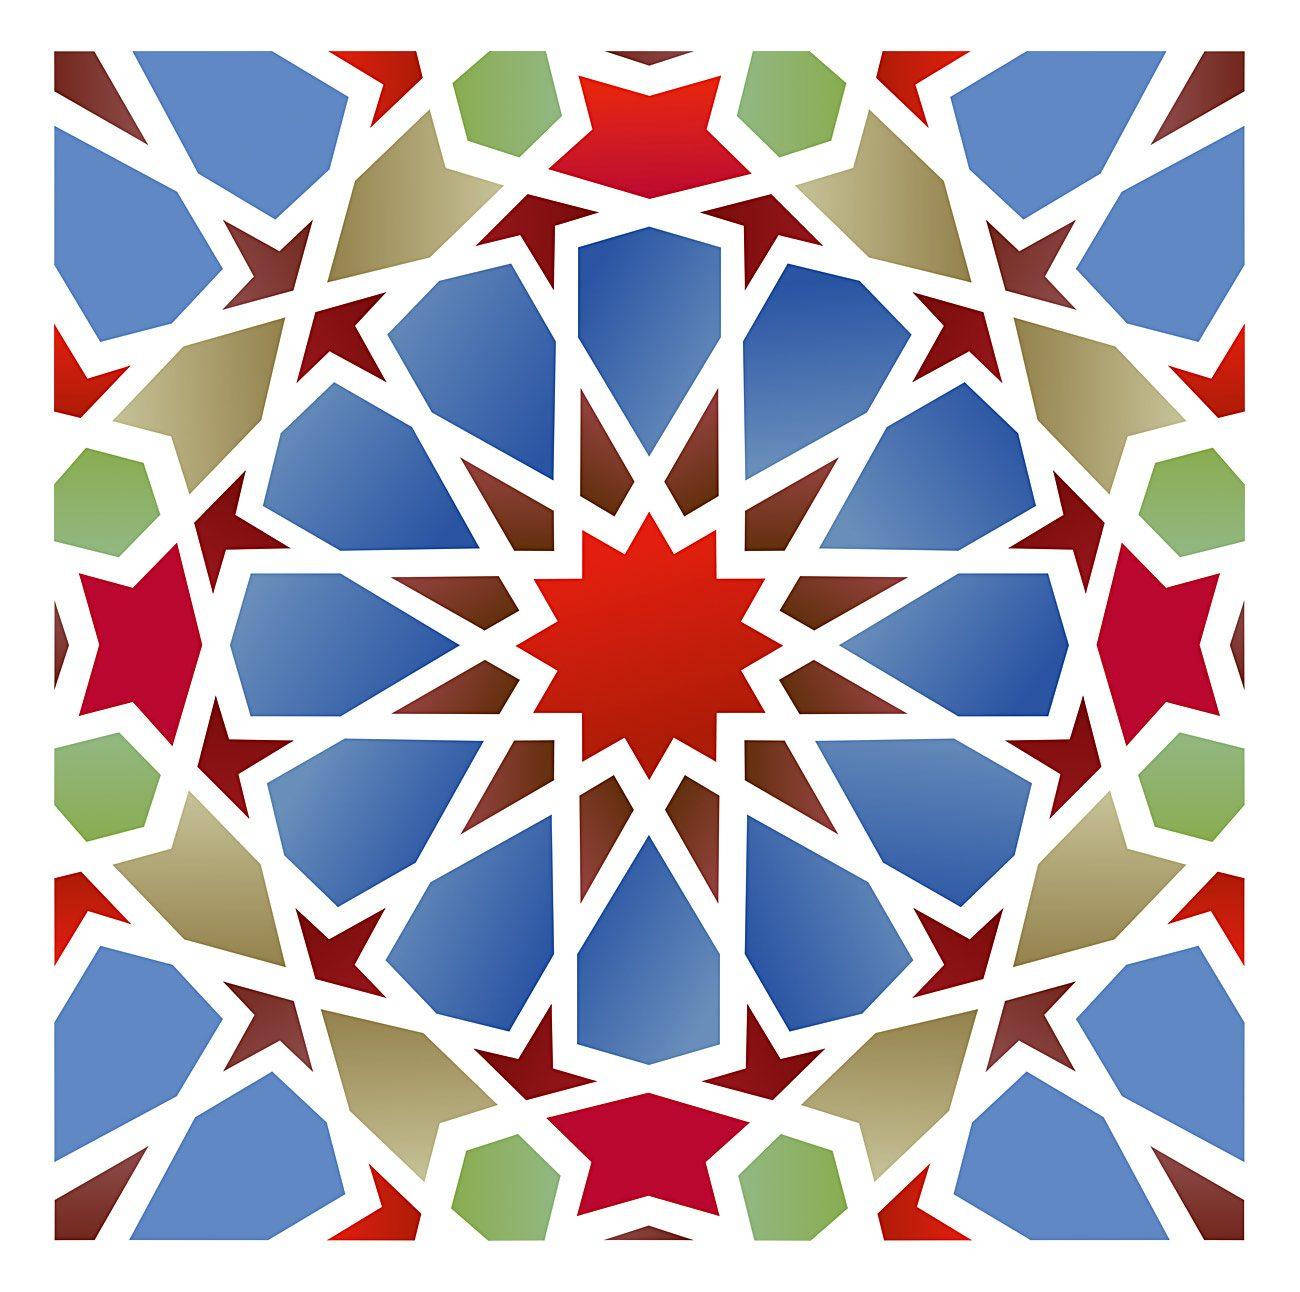 moroccan shapes templates - morrocan stencils with morrocan stencils latest decorate